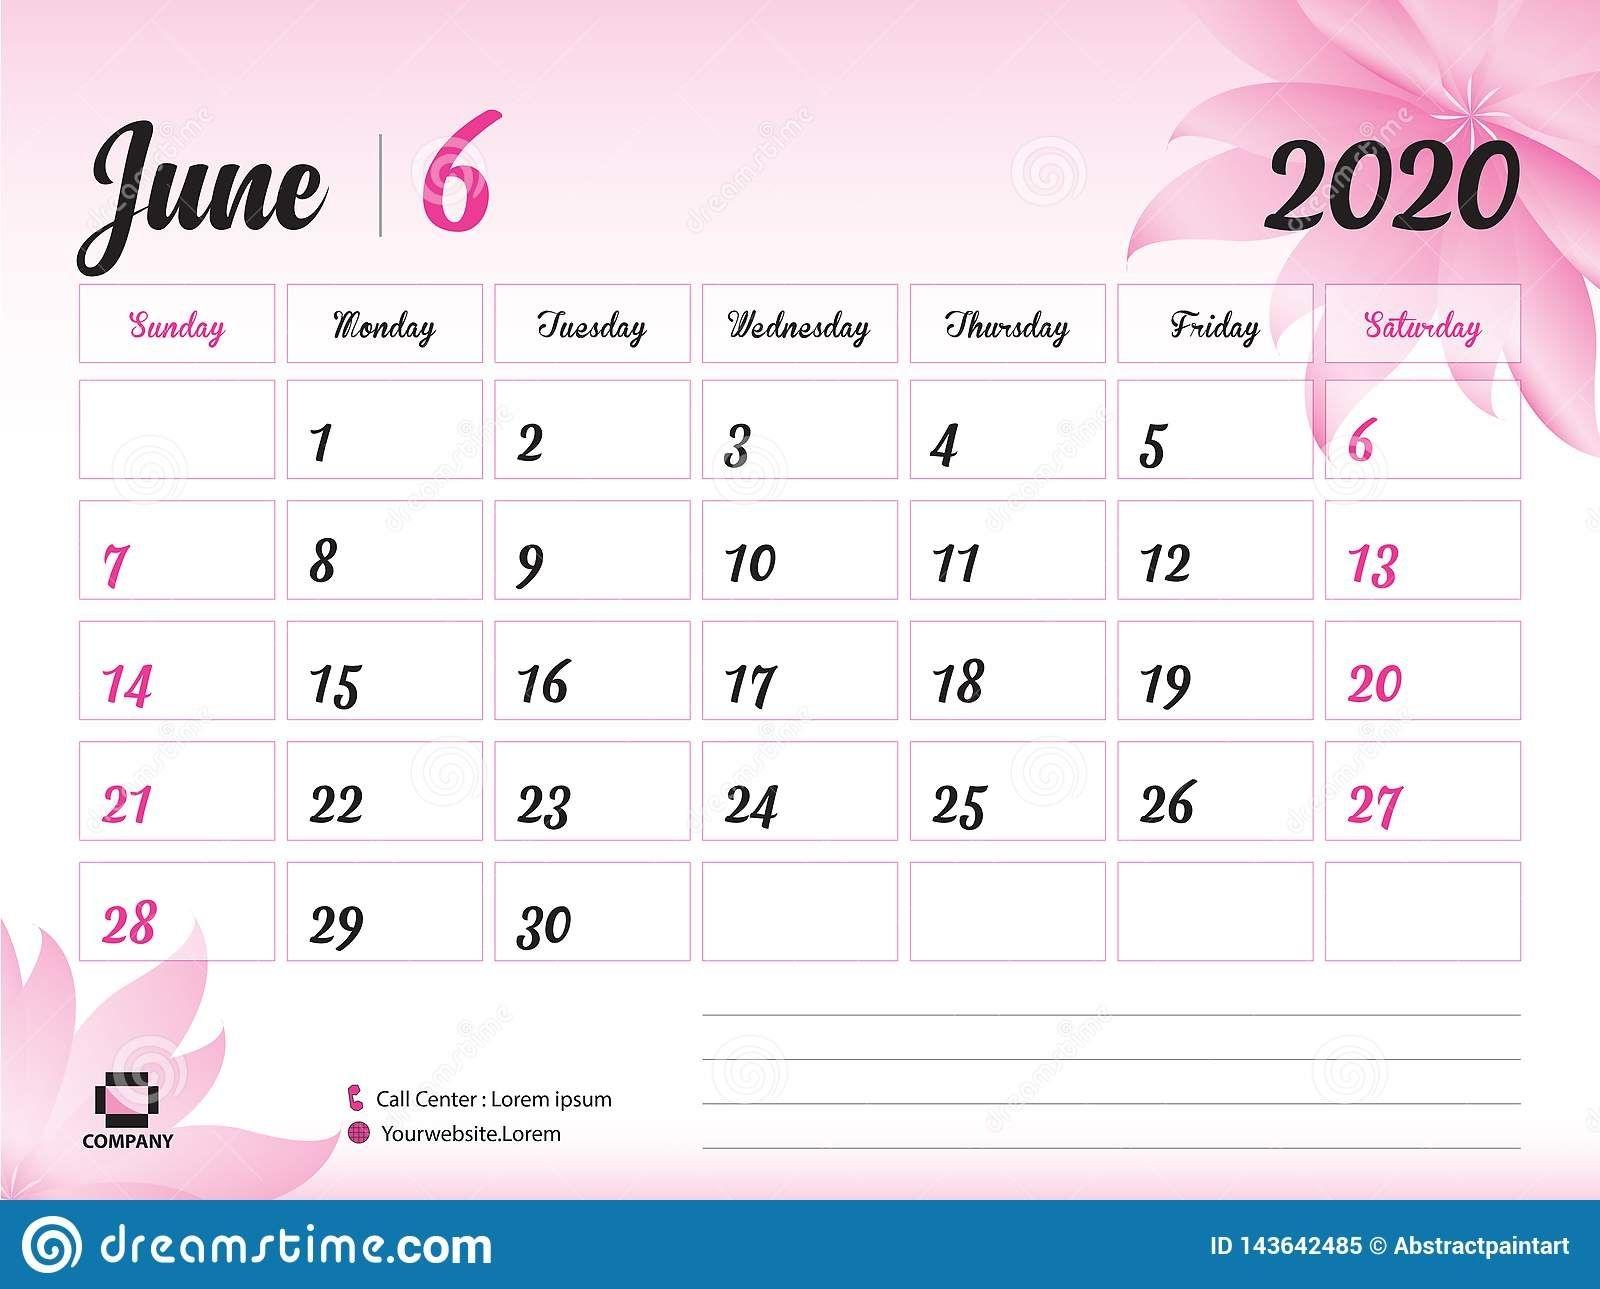 June 2020 Year Template, Calendar 2020 Vector, Desk Calendar